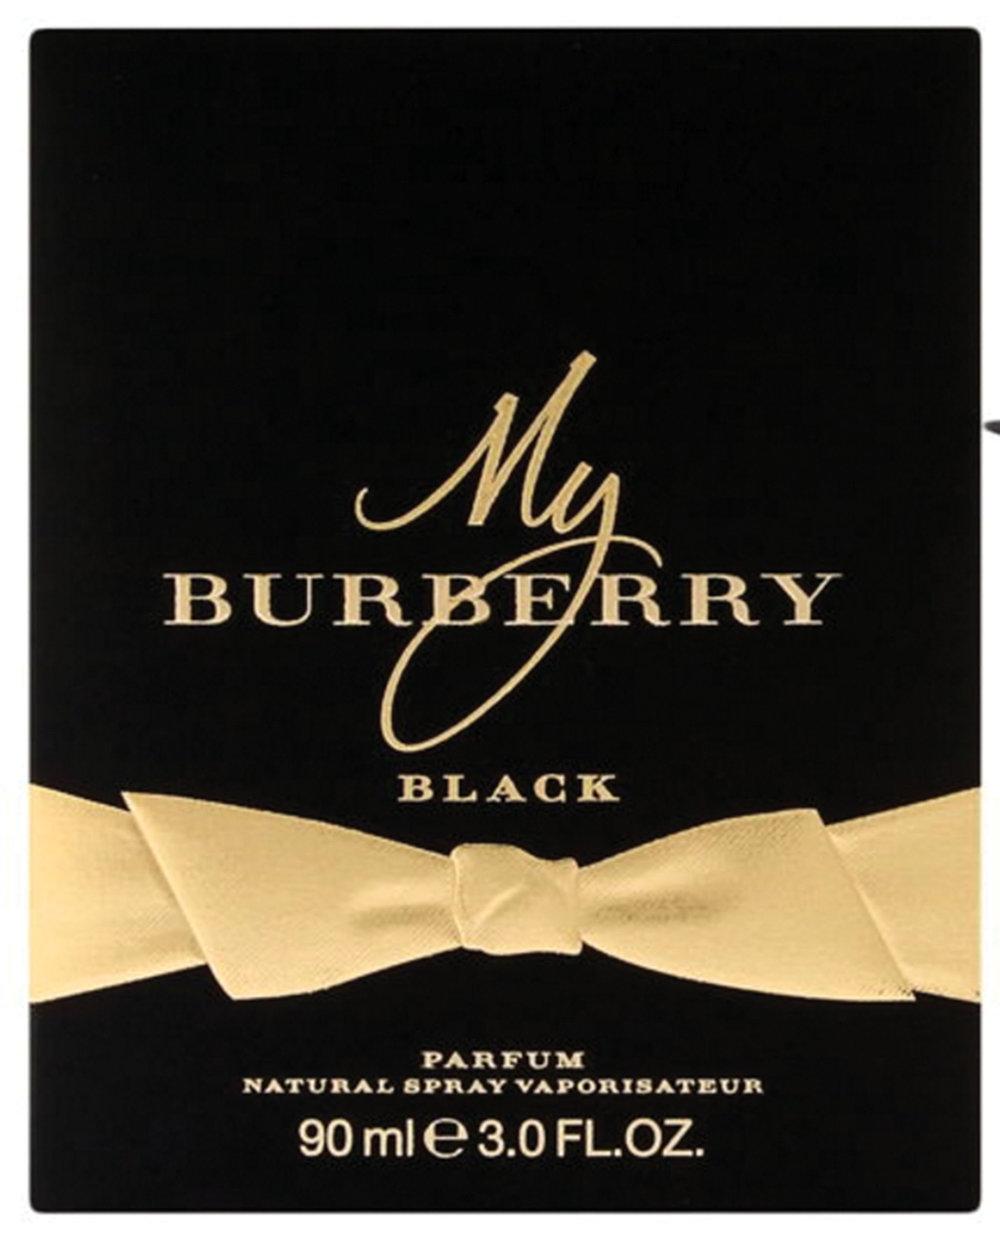 8.My Burberry Black Perfume 90ml by Burberry $138,  burberry.ca